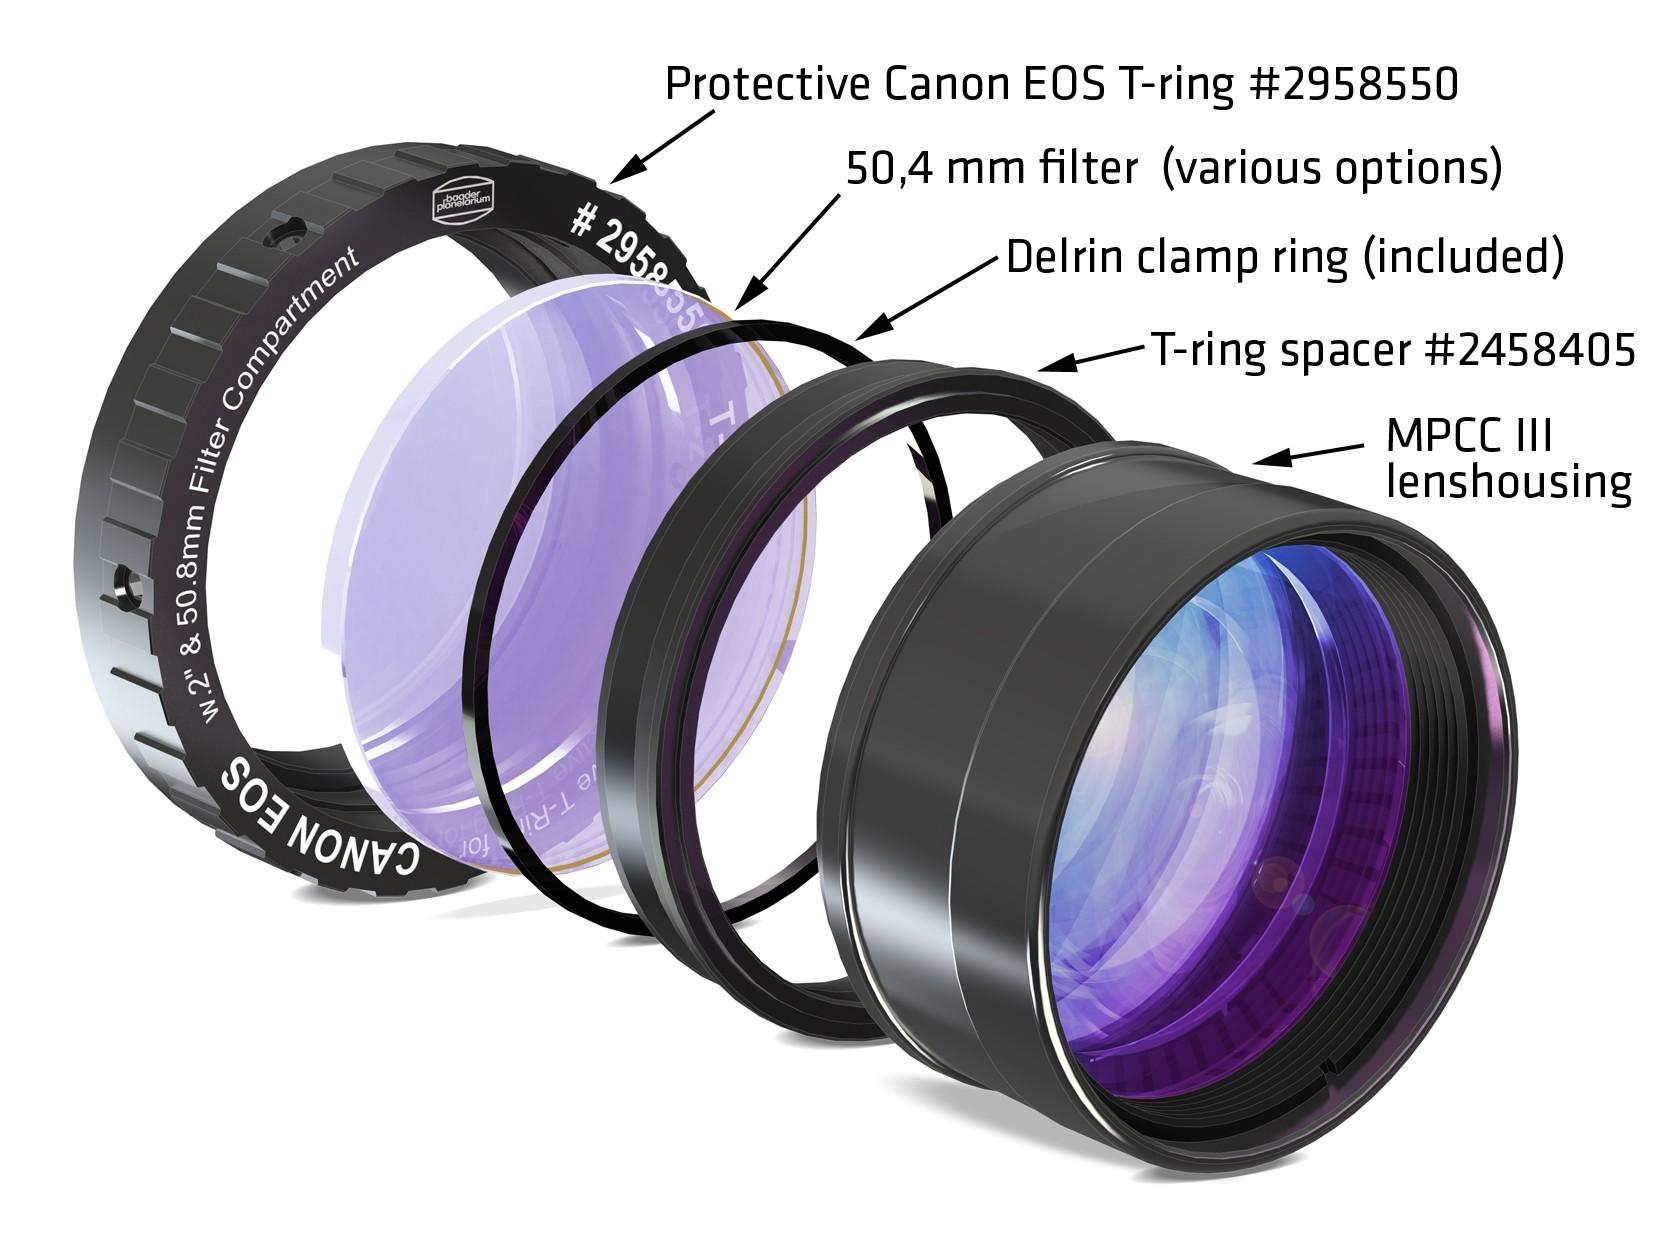 Anwendungsbild: MPCC Mark III  mit Protective T-Ring